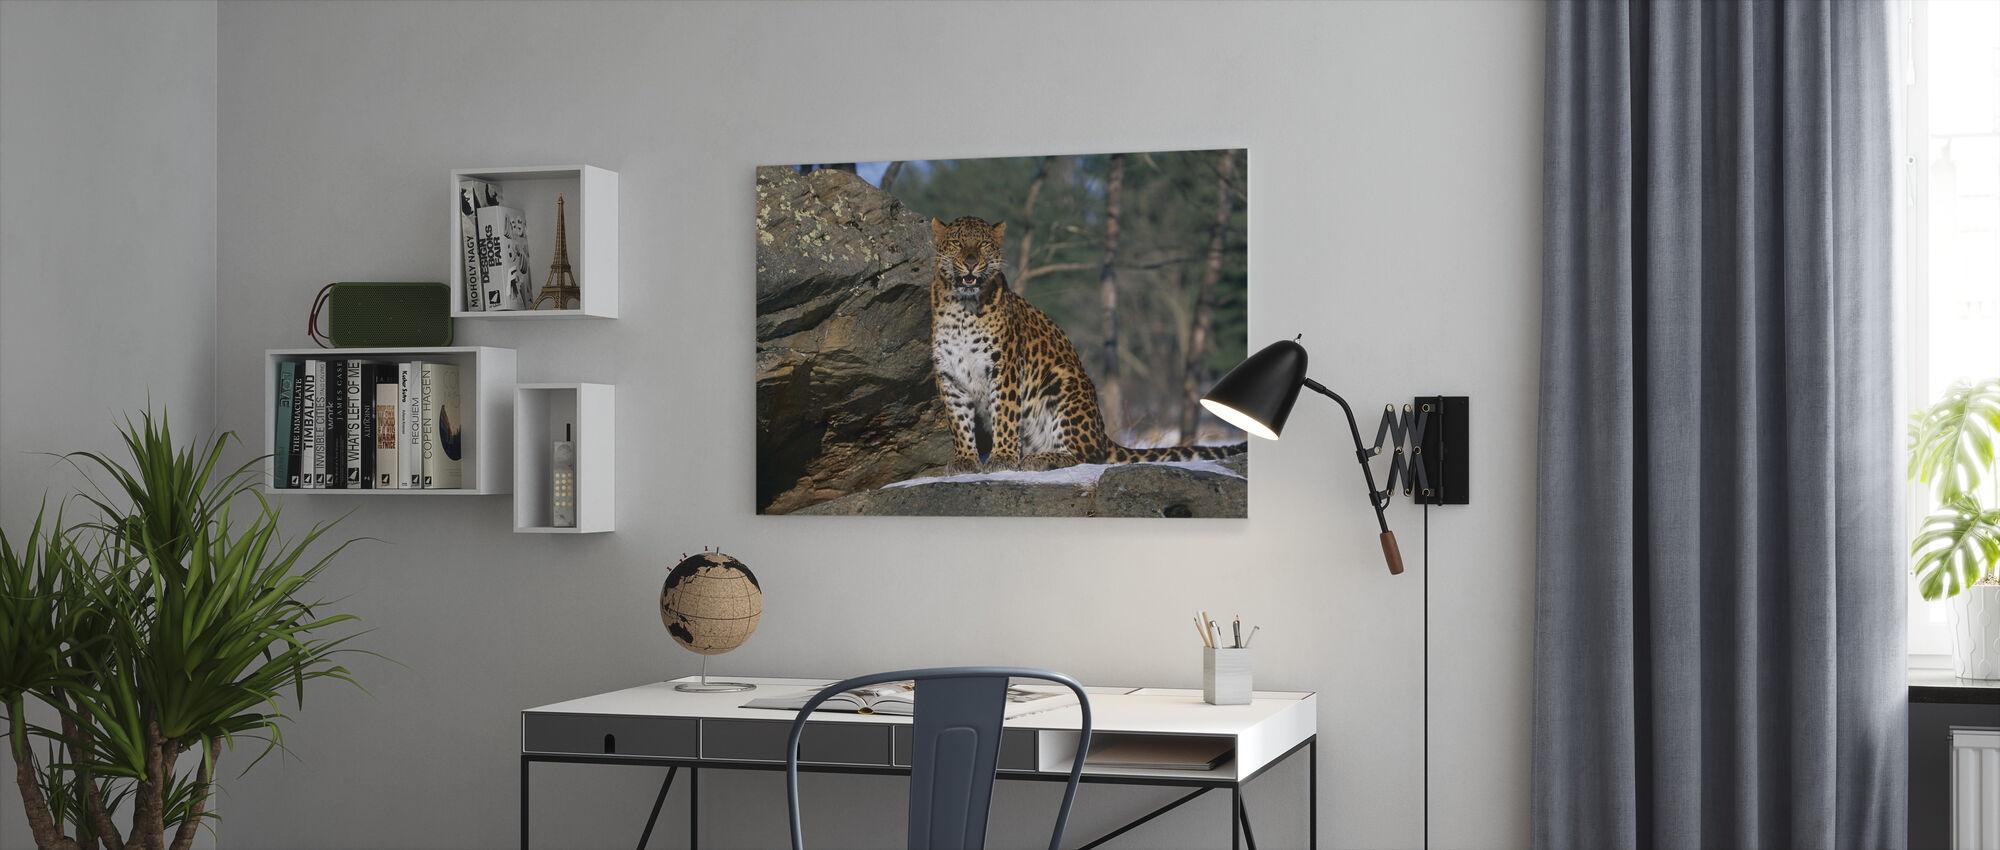 Sitting Leopard - Canvas print - Office